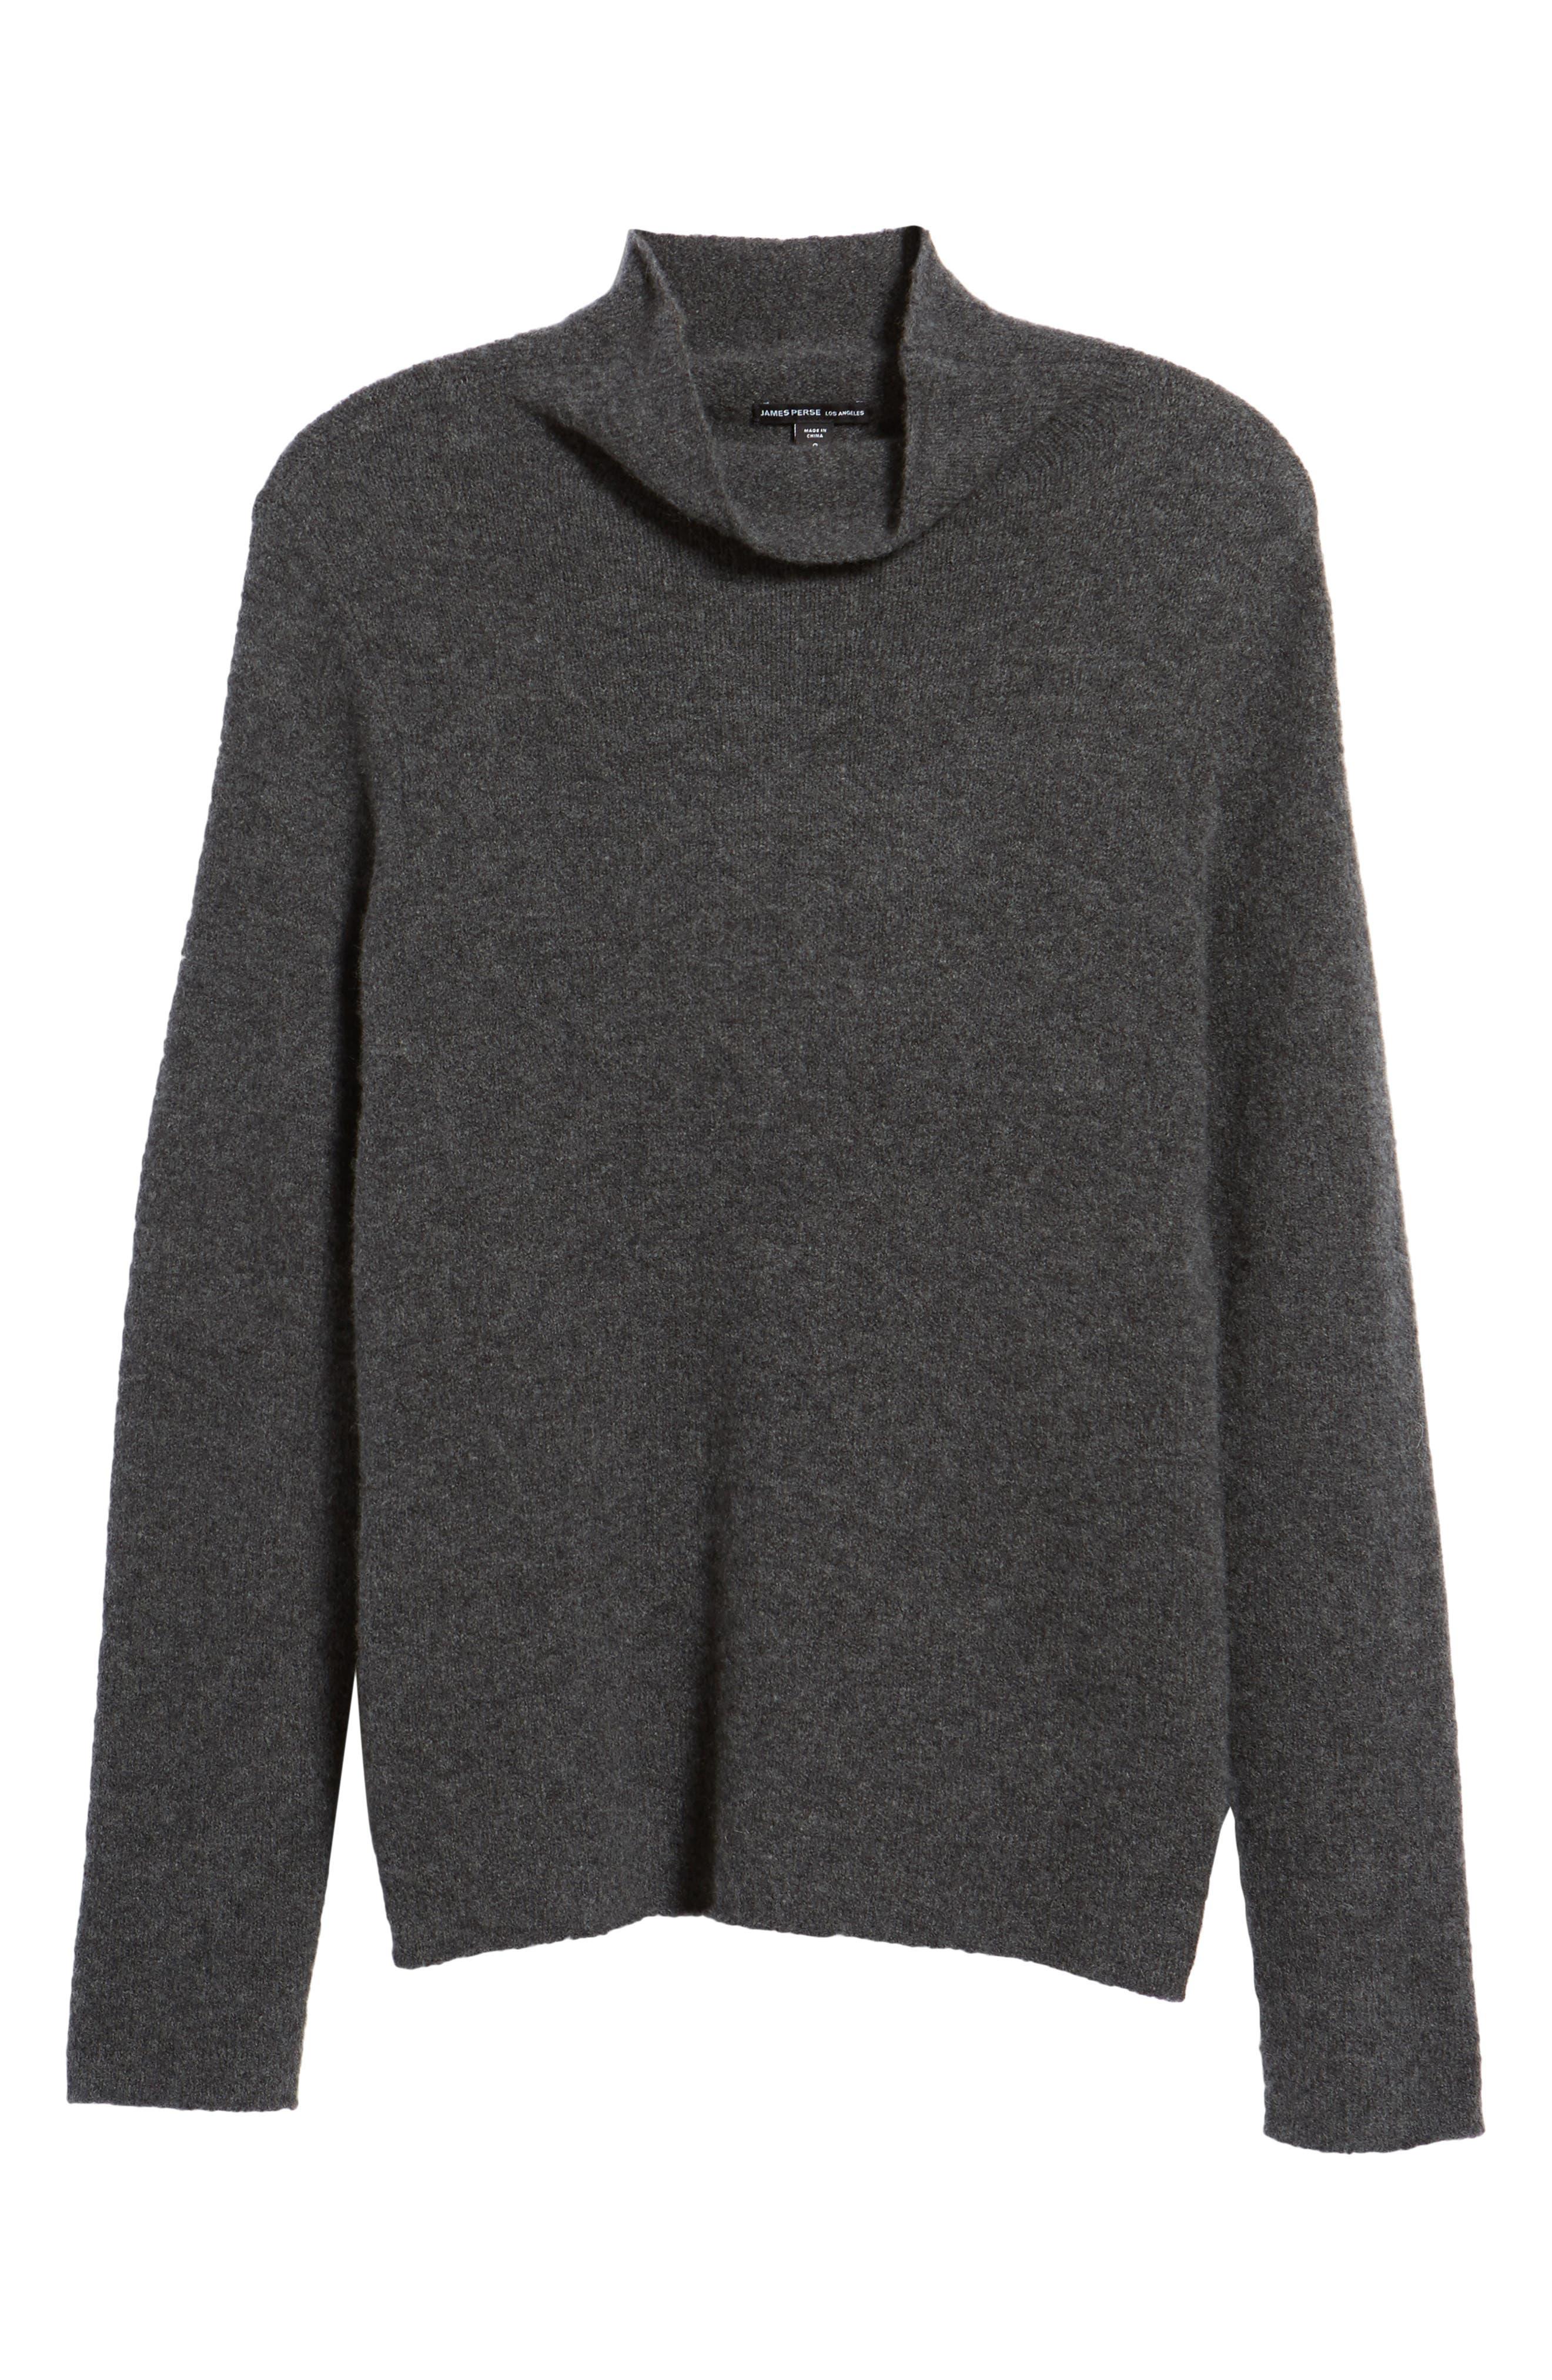 Stretch Cashmere Mock Neck Sweater,                             Alternate thumbnail 6, color,                             069